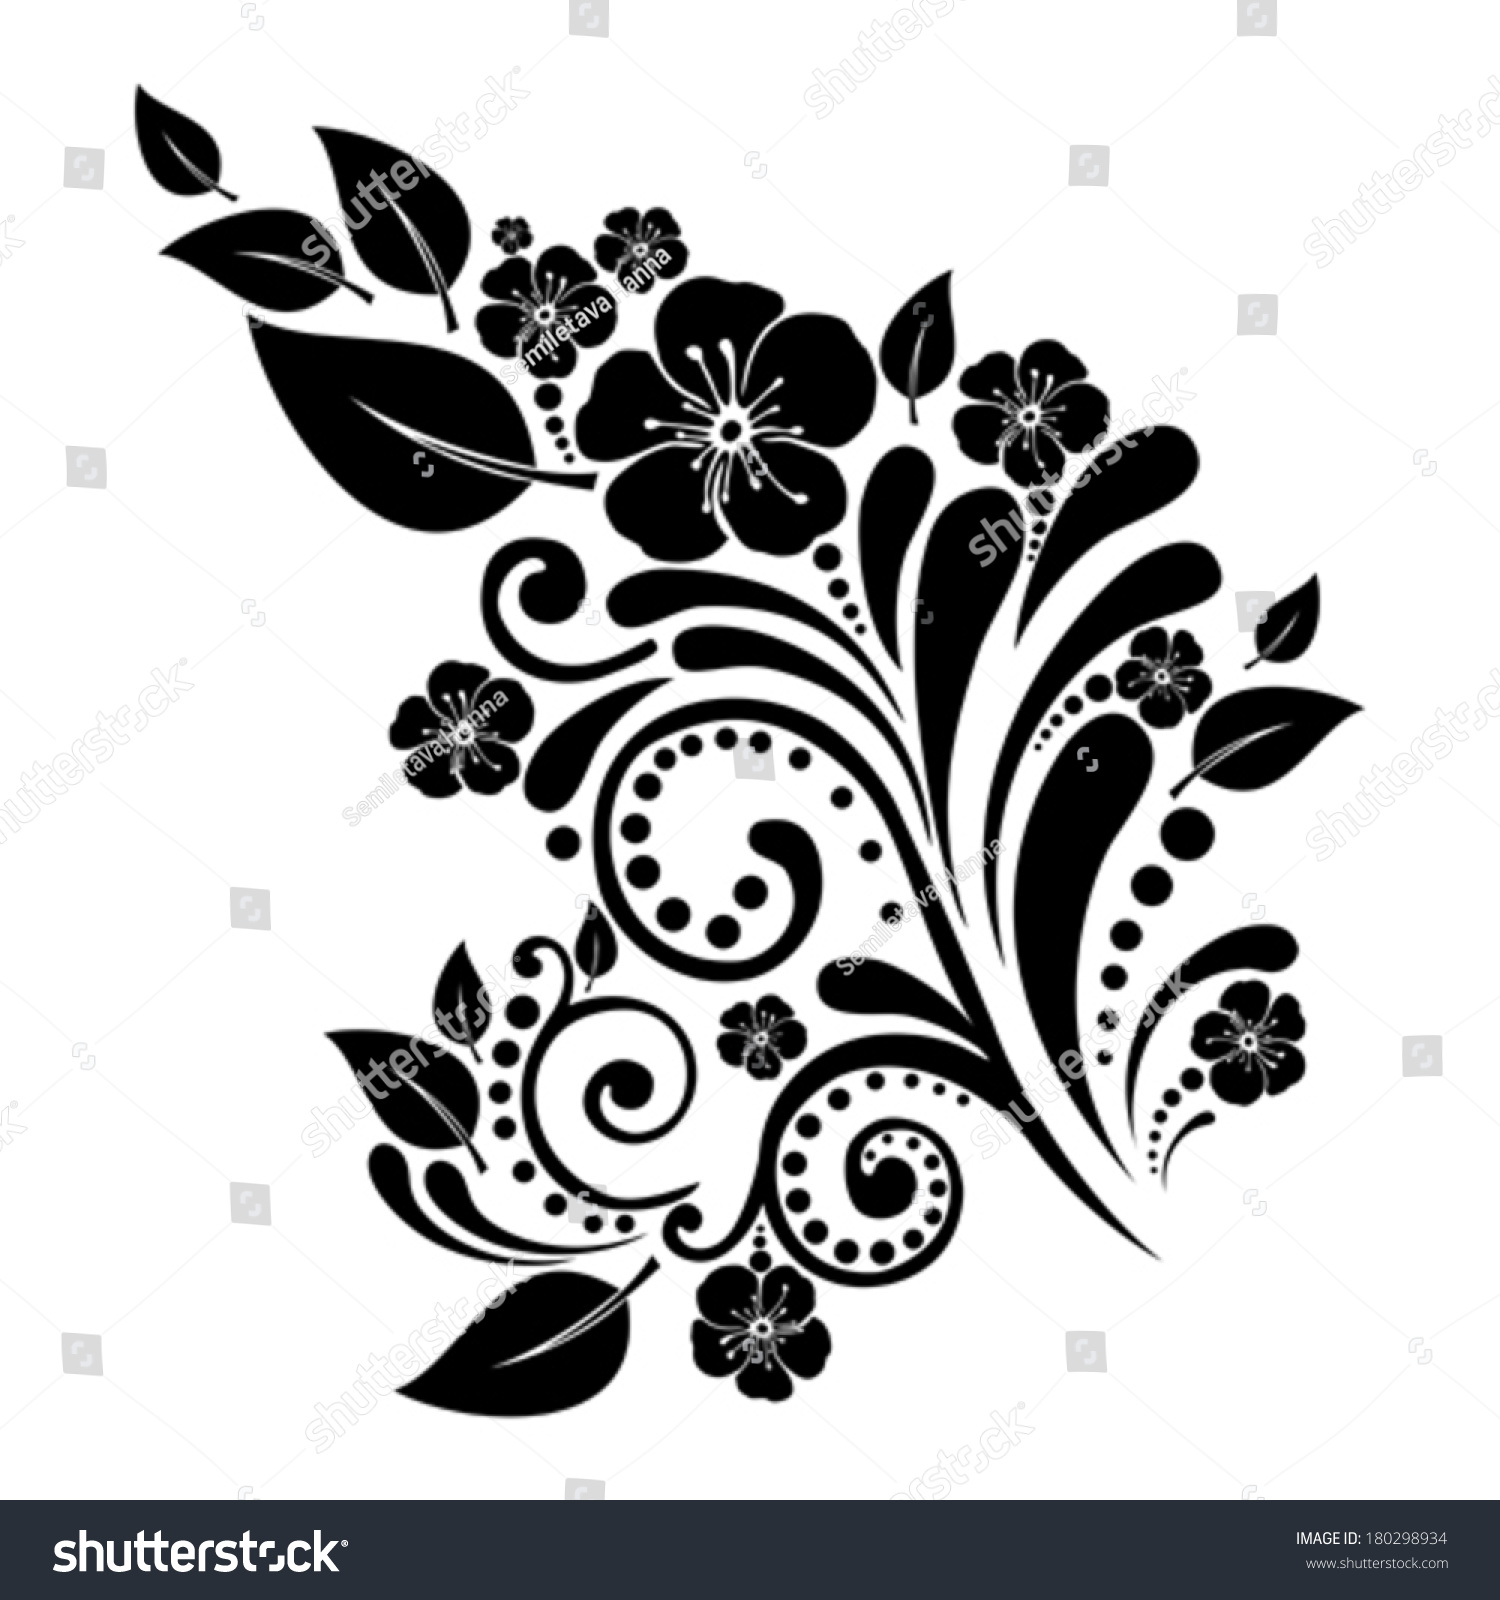 Black Flower Isolated On White Background. Vector